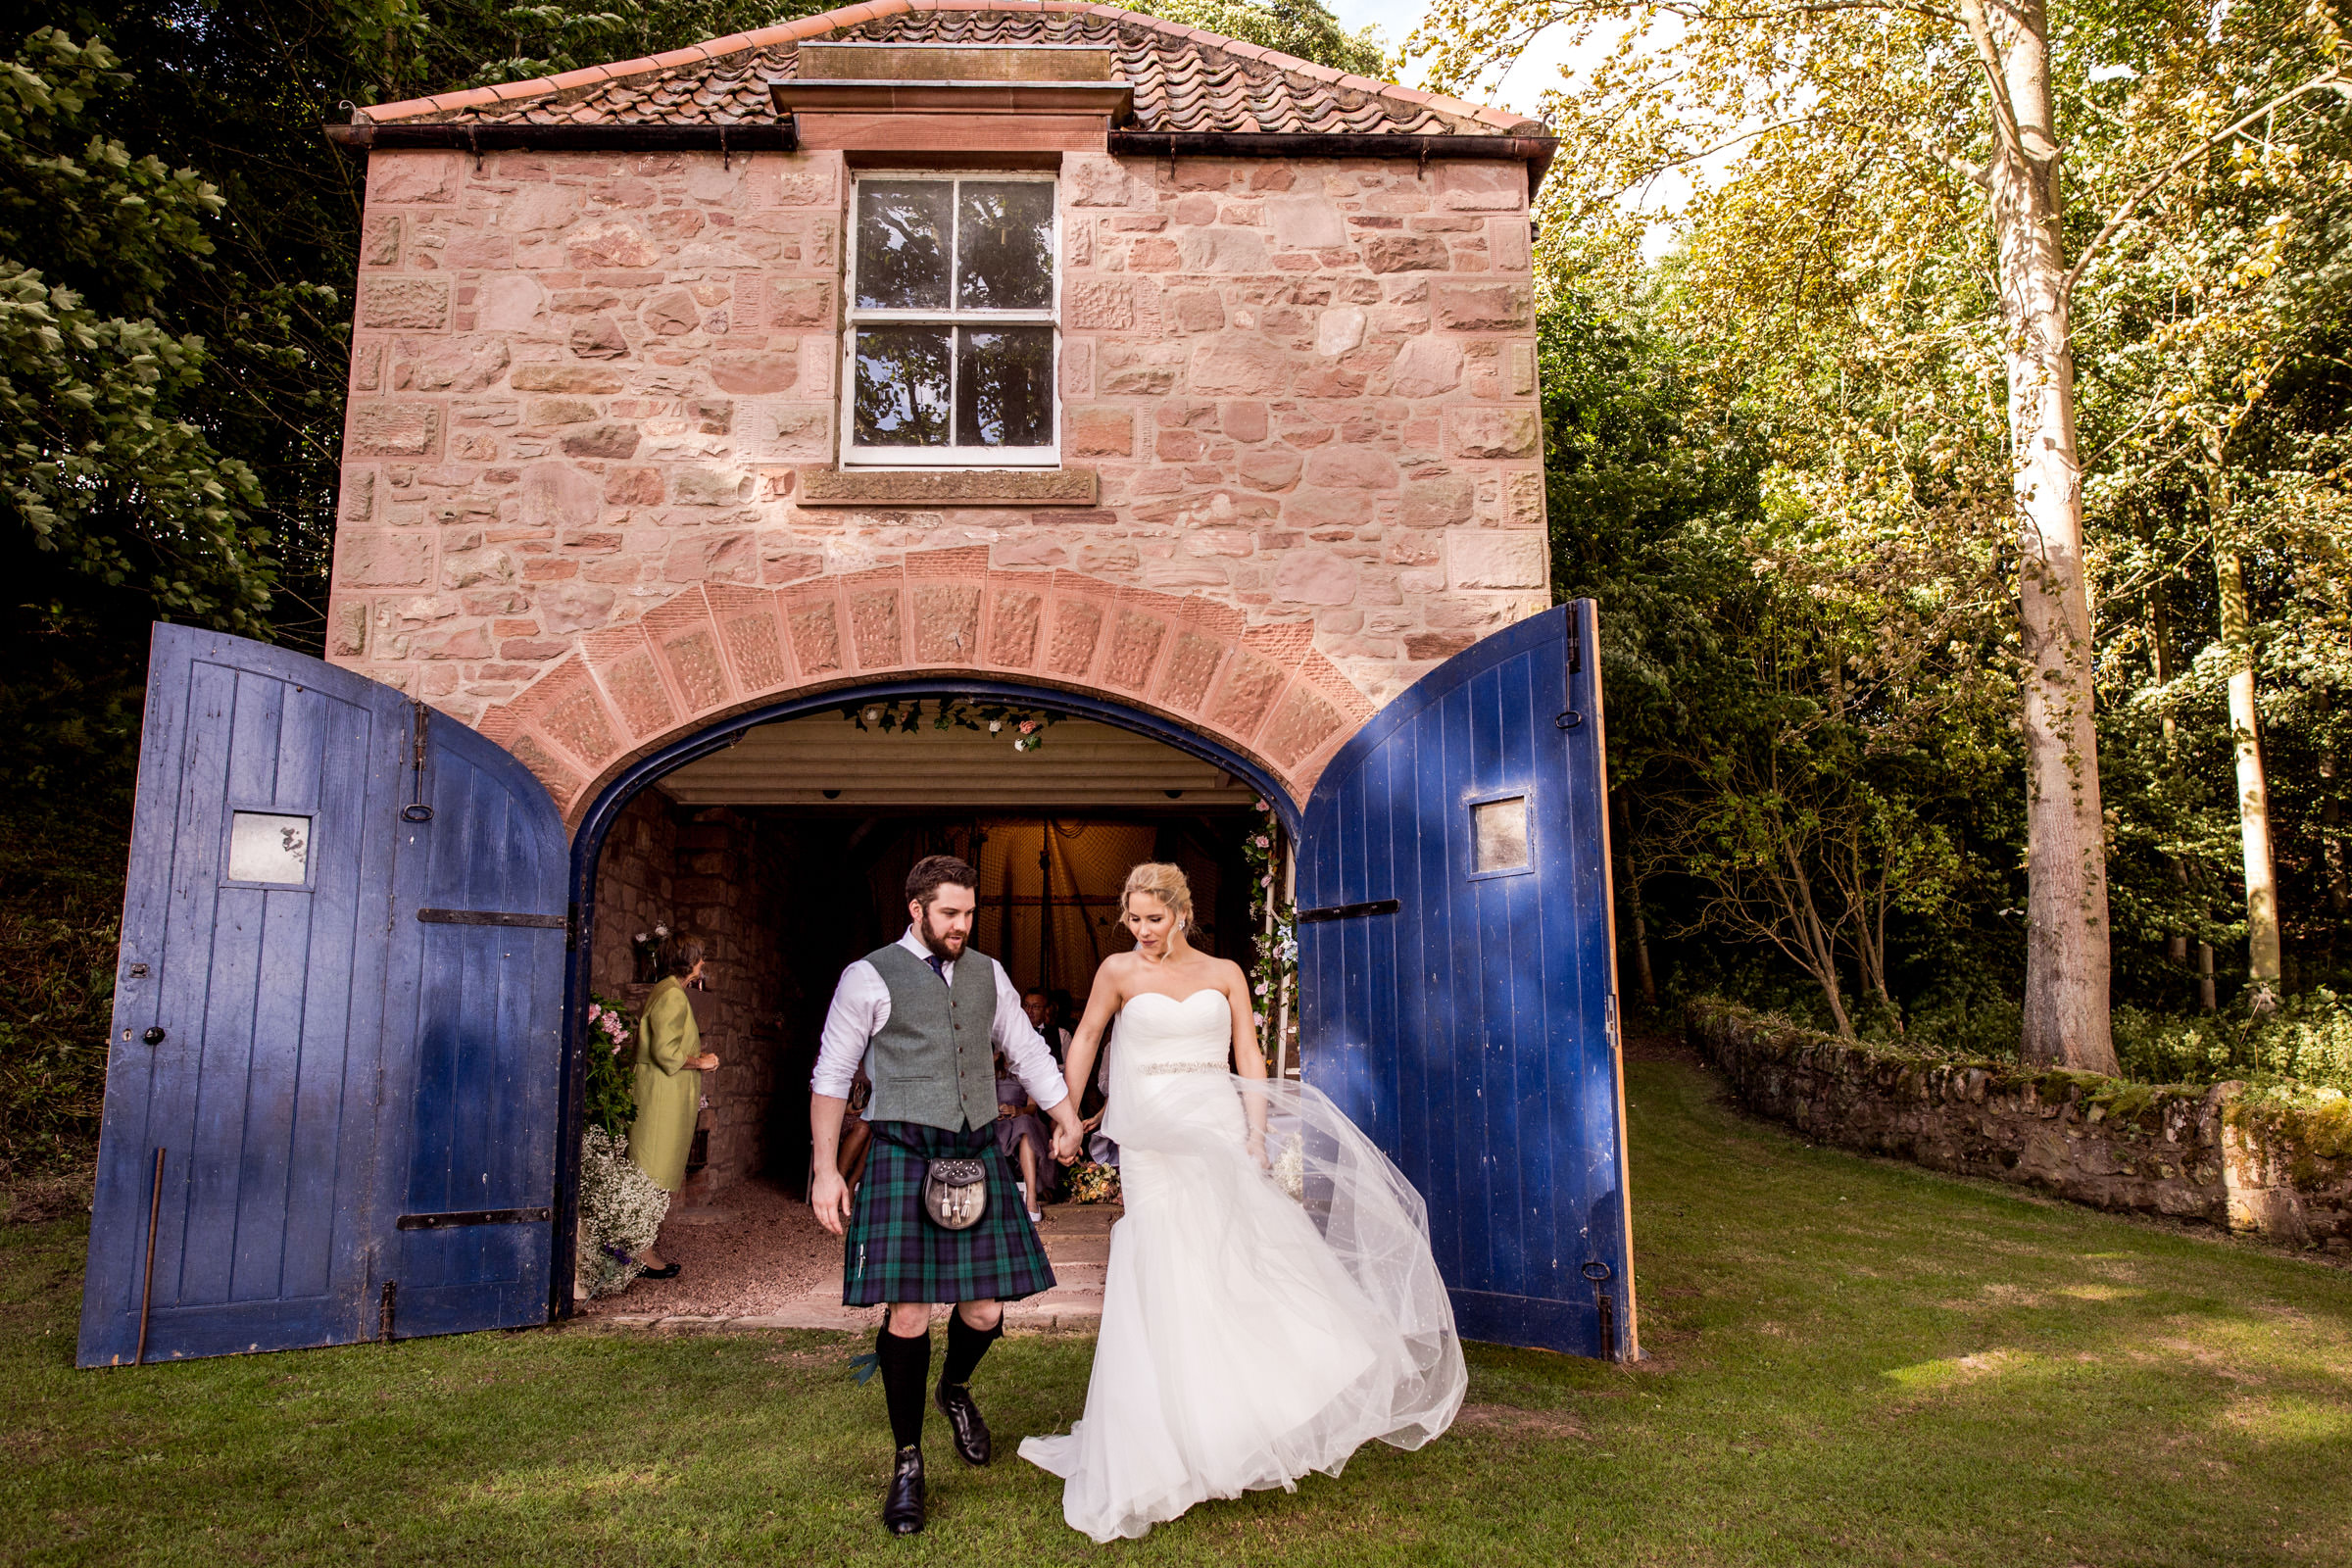 Documentart wedding photographers Berwick-upon-Tweed 010.jpg